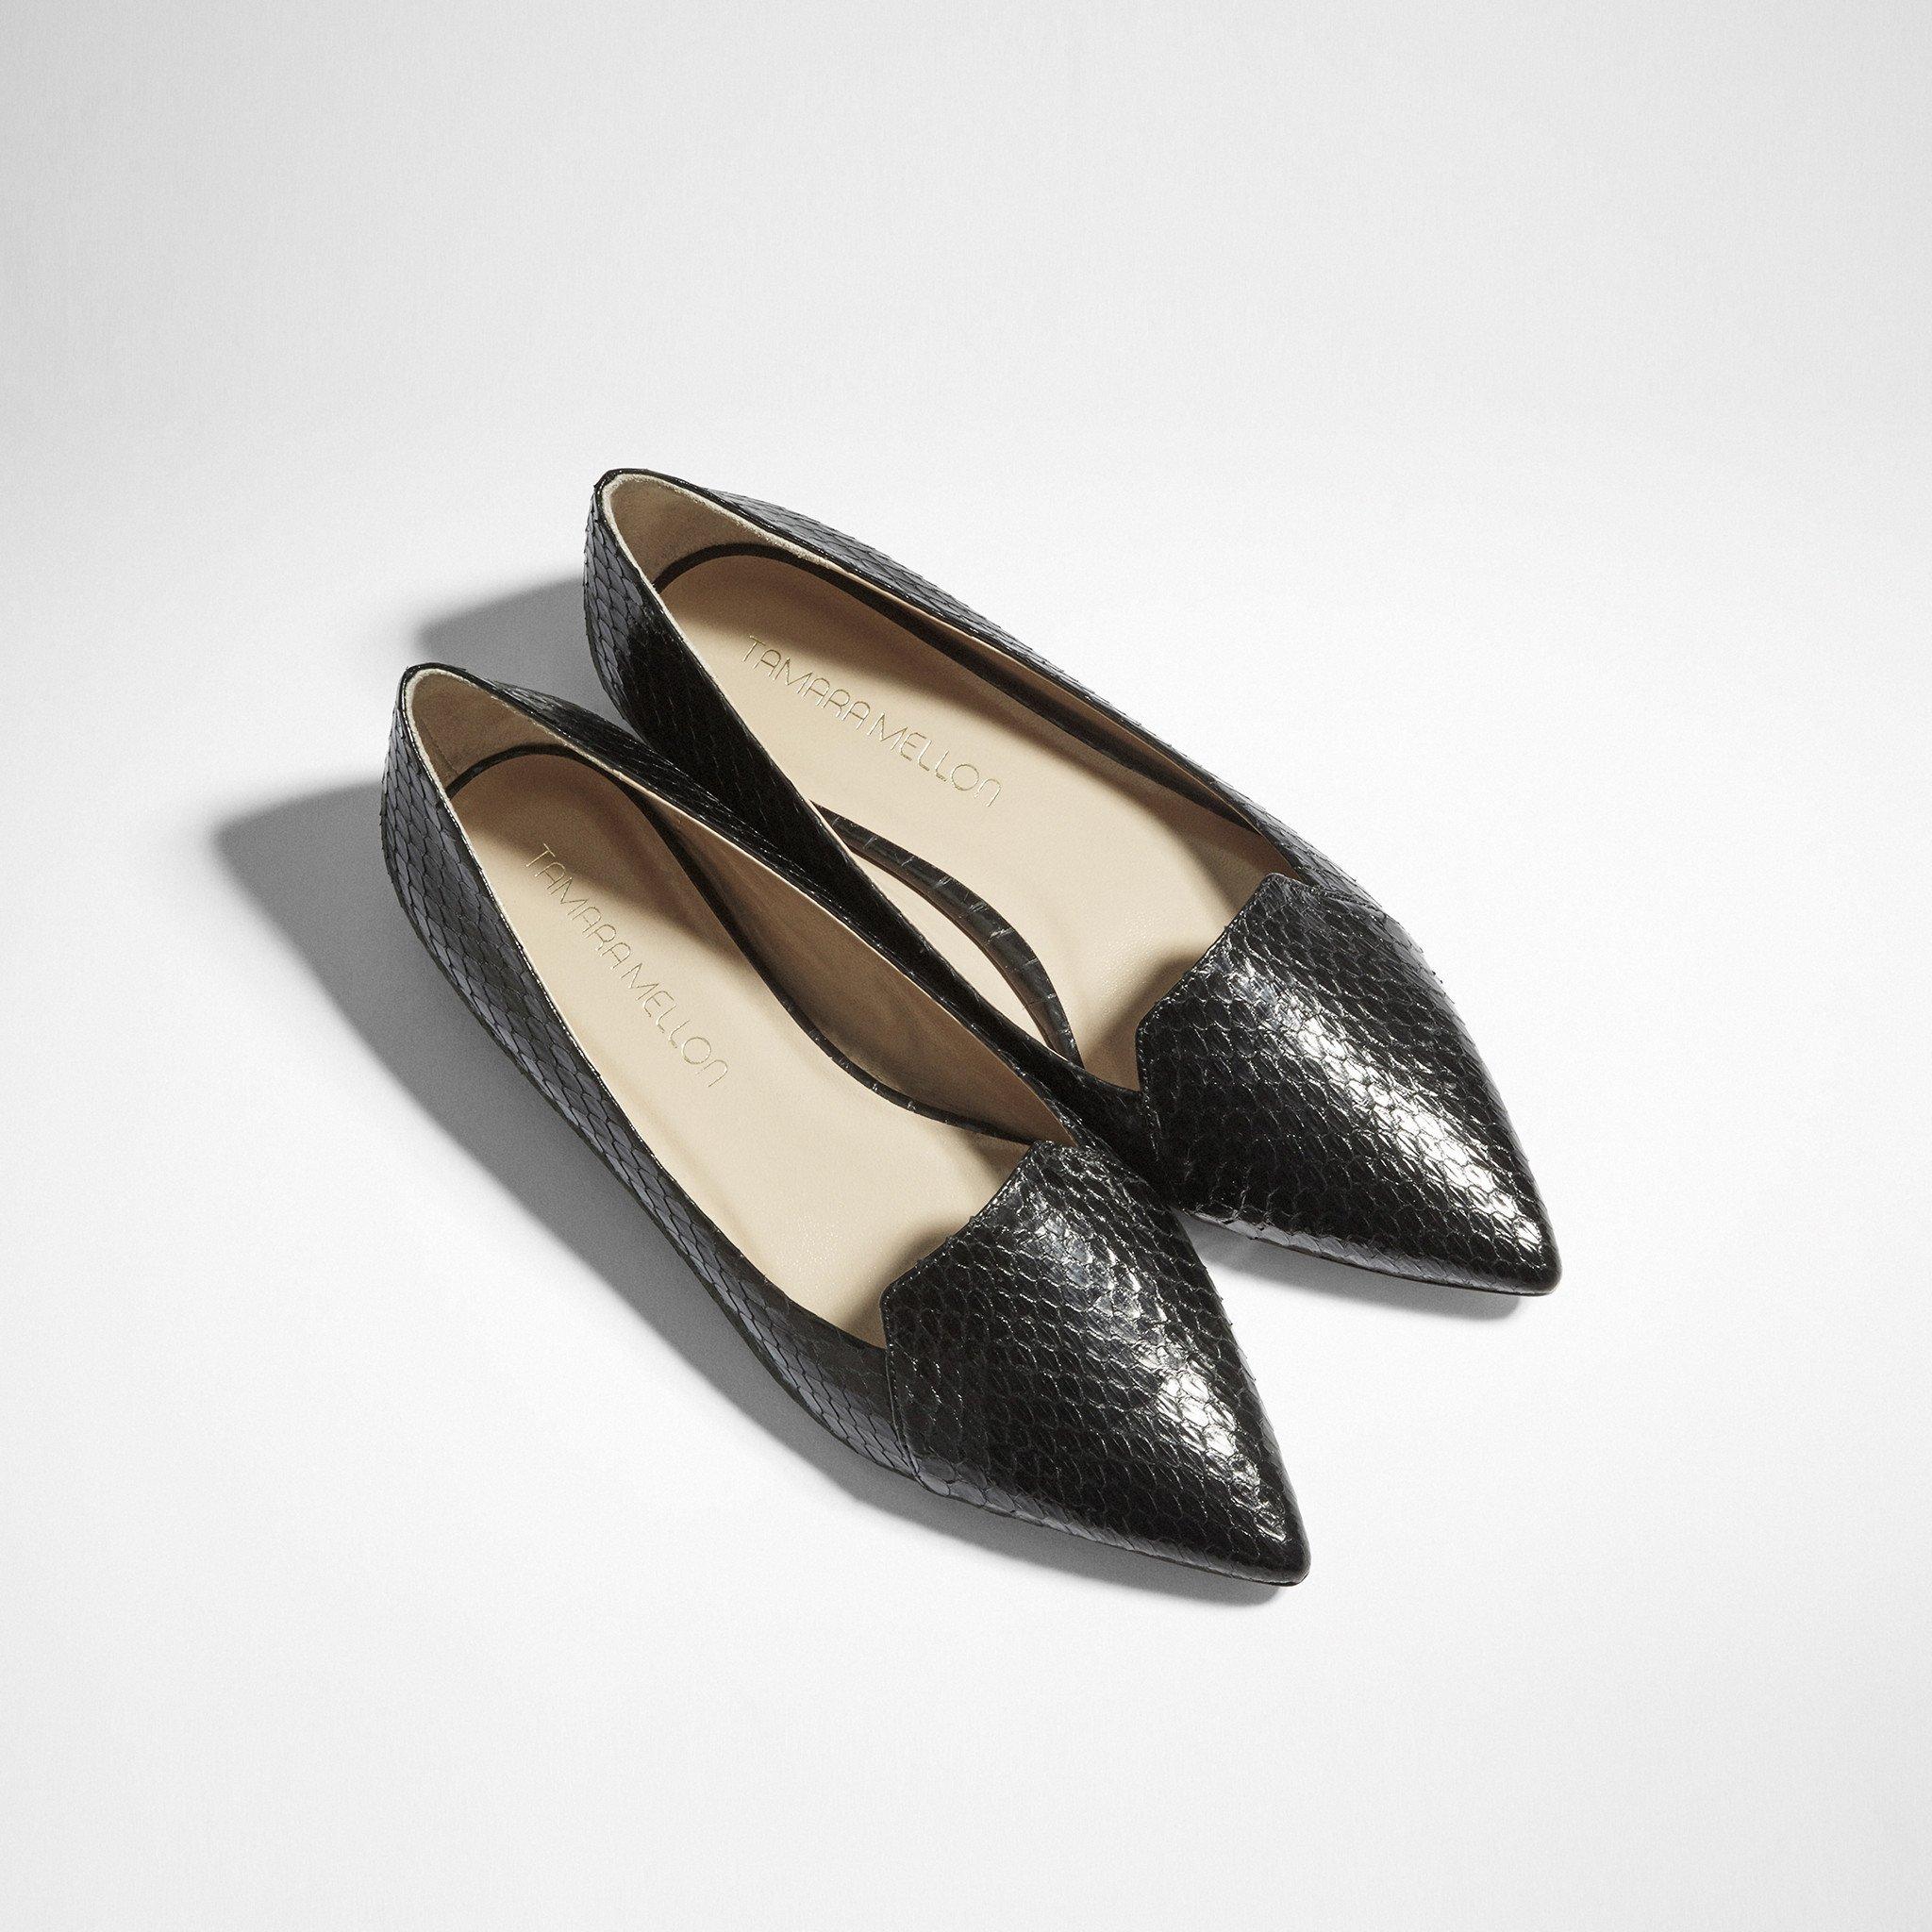 Tamara Mellon Grace Pointed-Toe Flats cheap sale genuine Inexpensive for sale 1Fzz90r